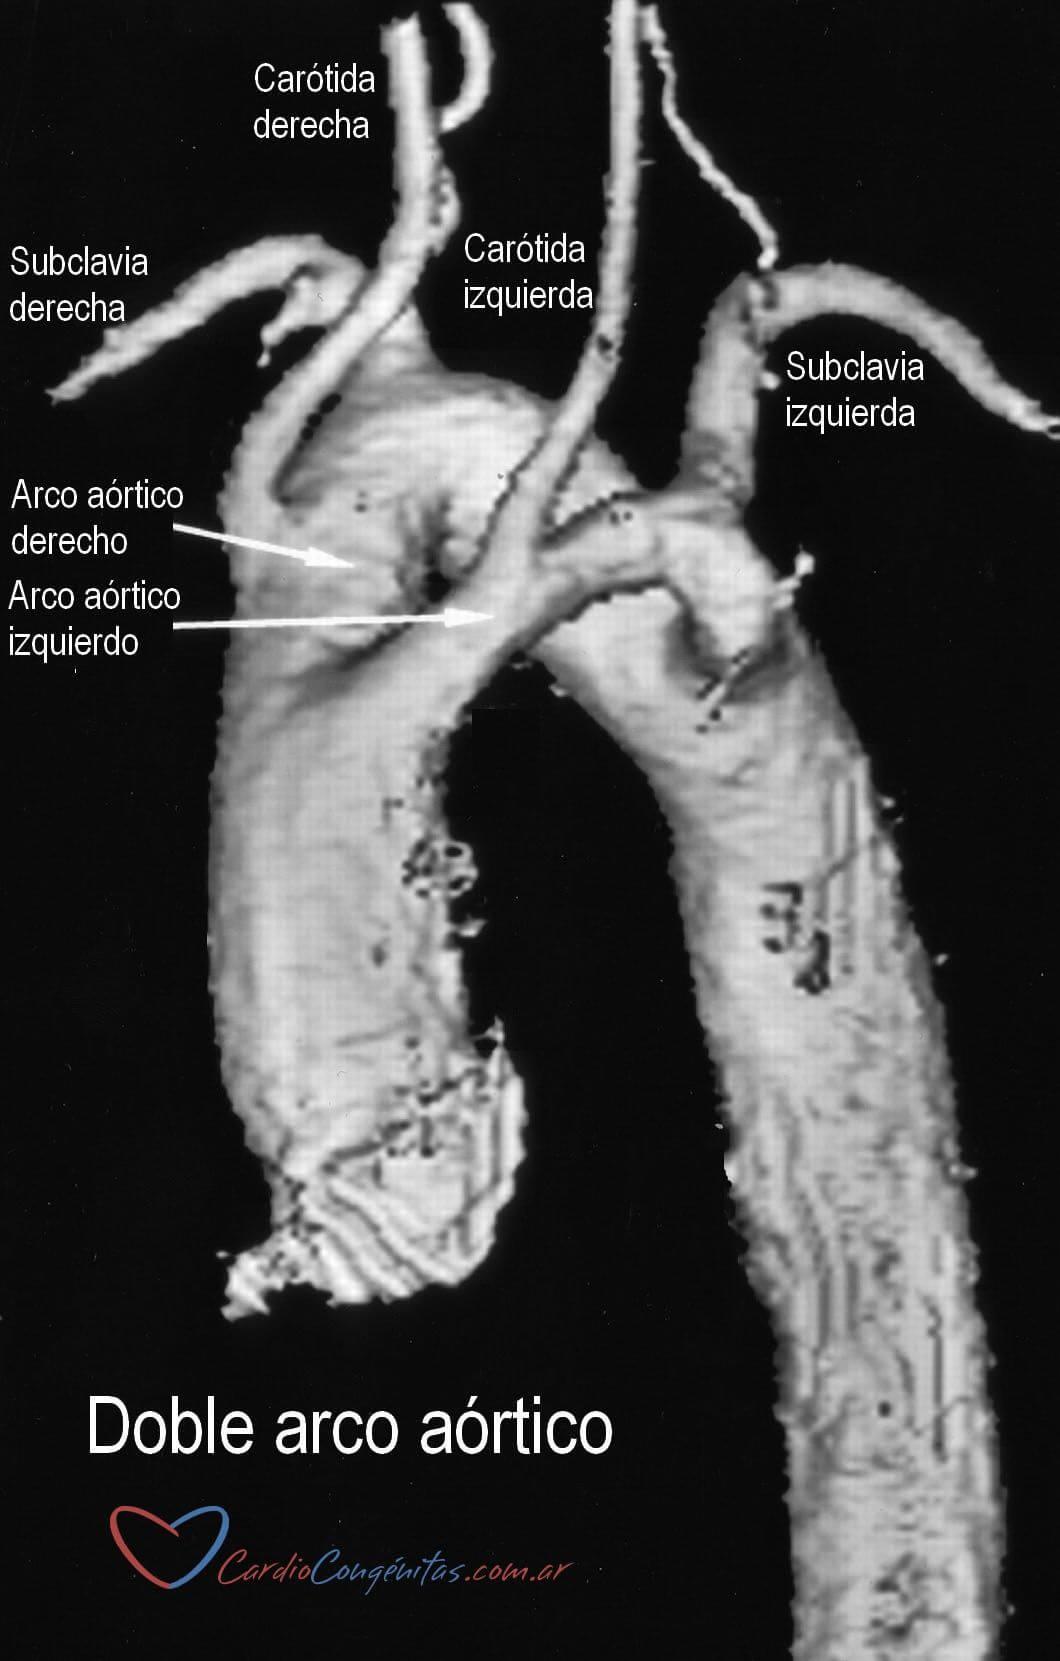 RMN-doble-arco